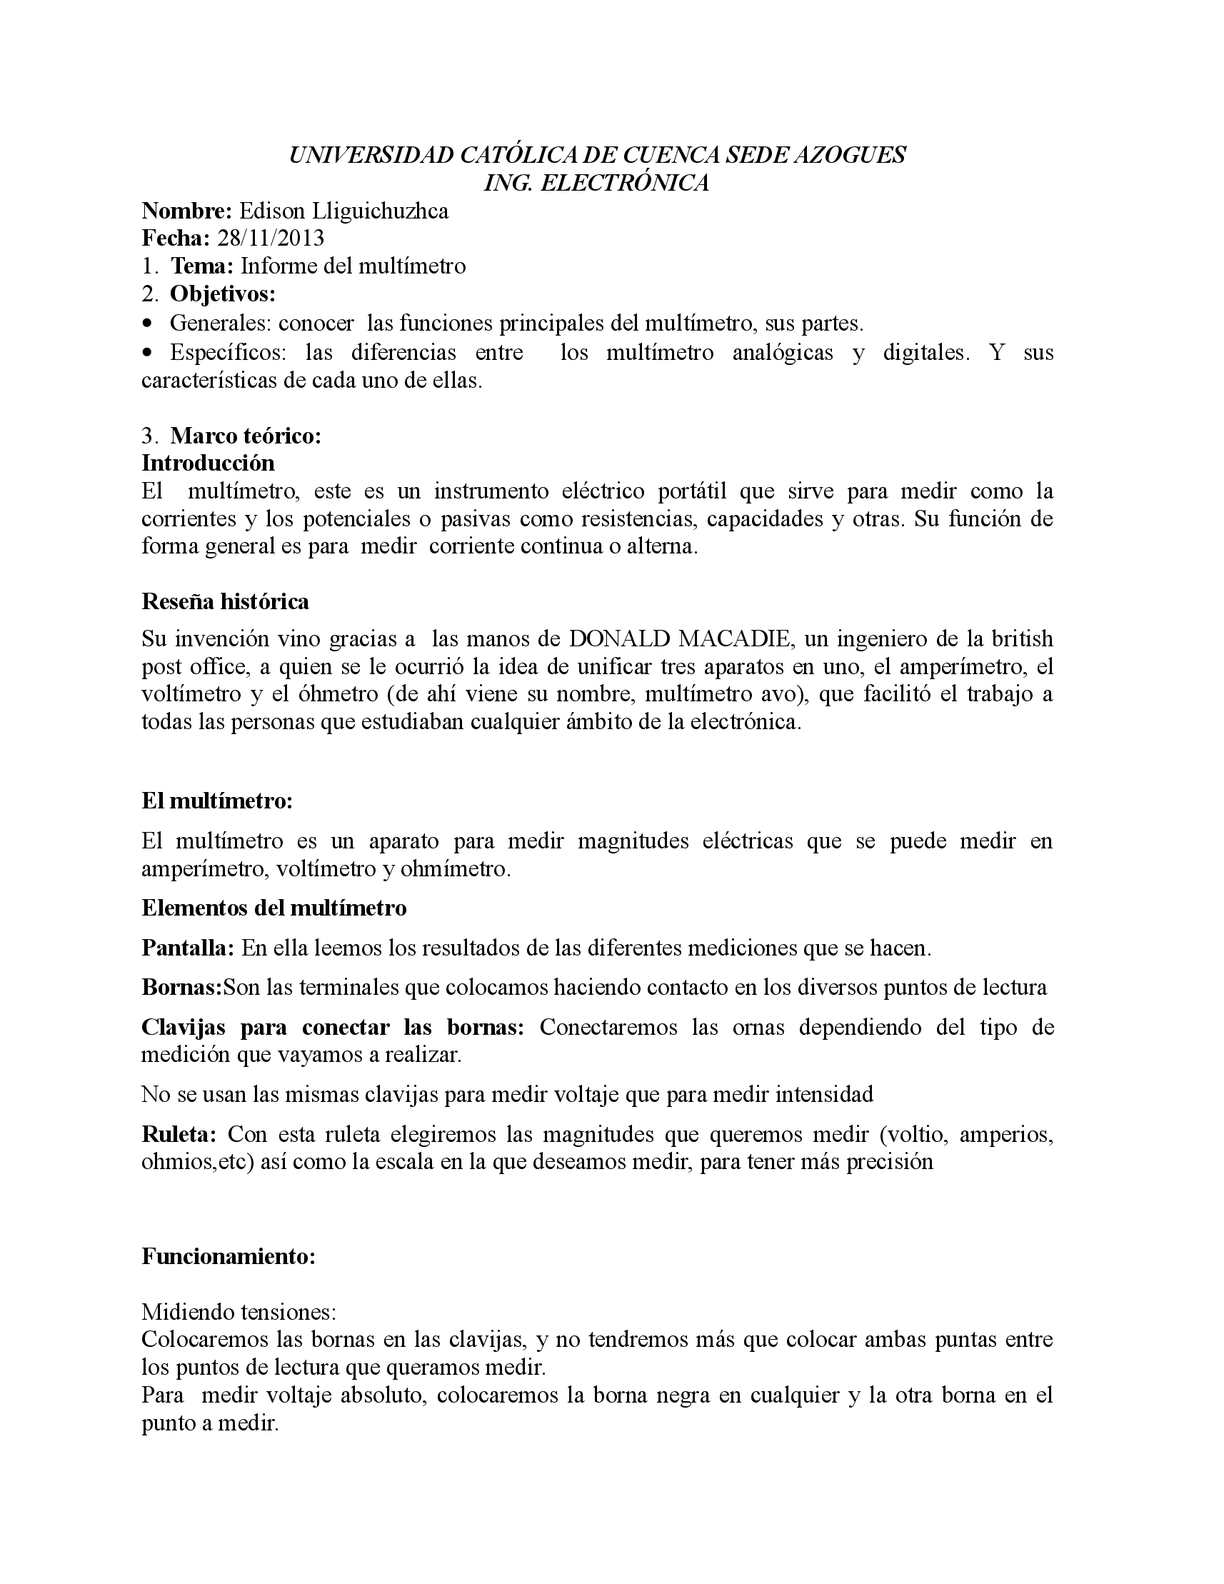 Calaméo - Informe del Multimetro